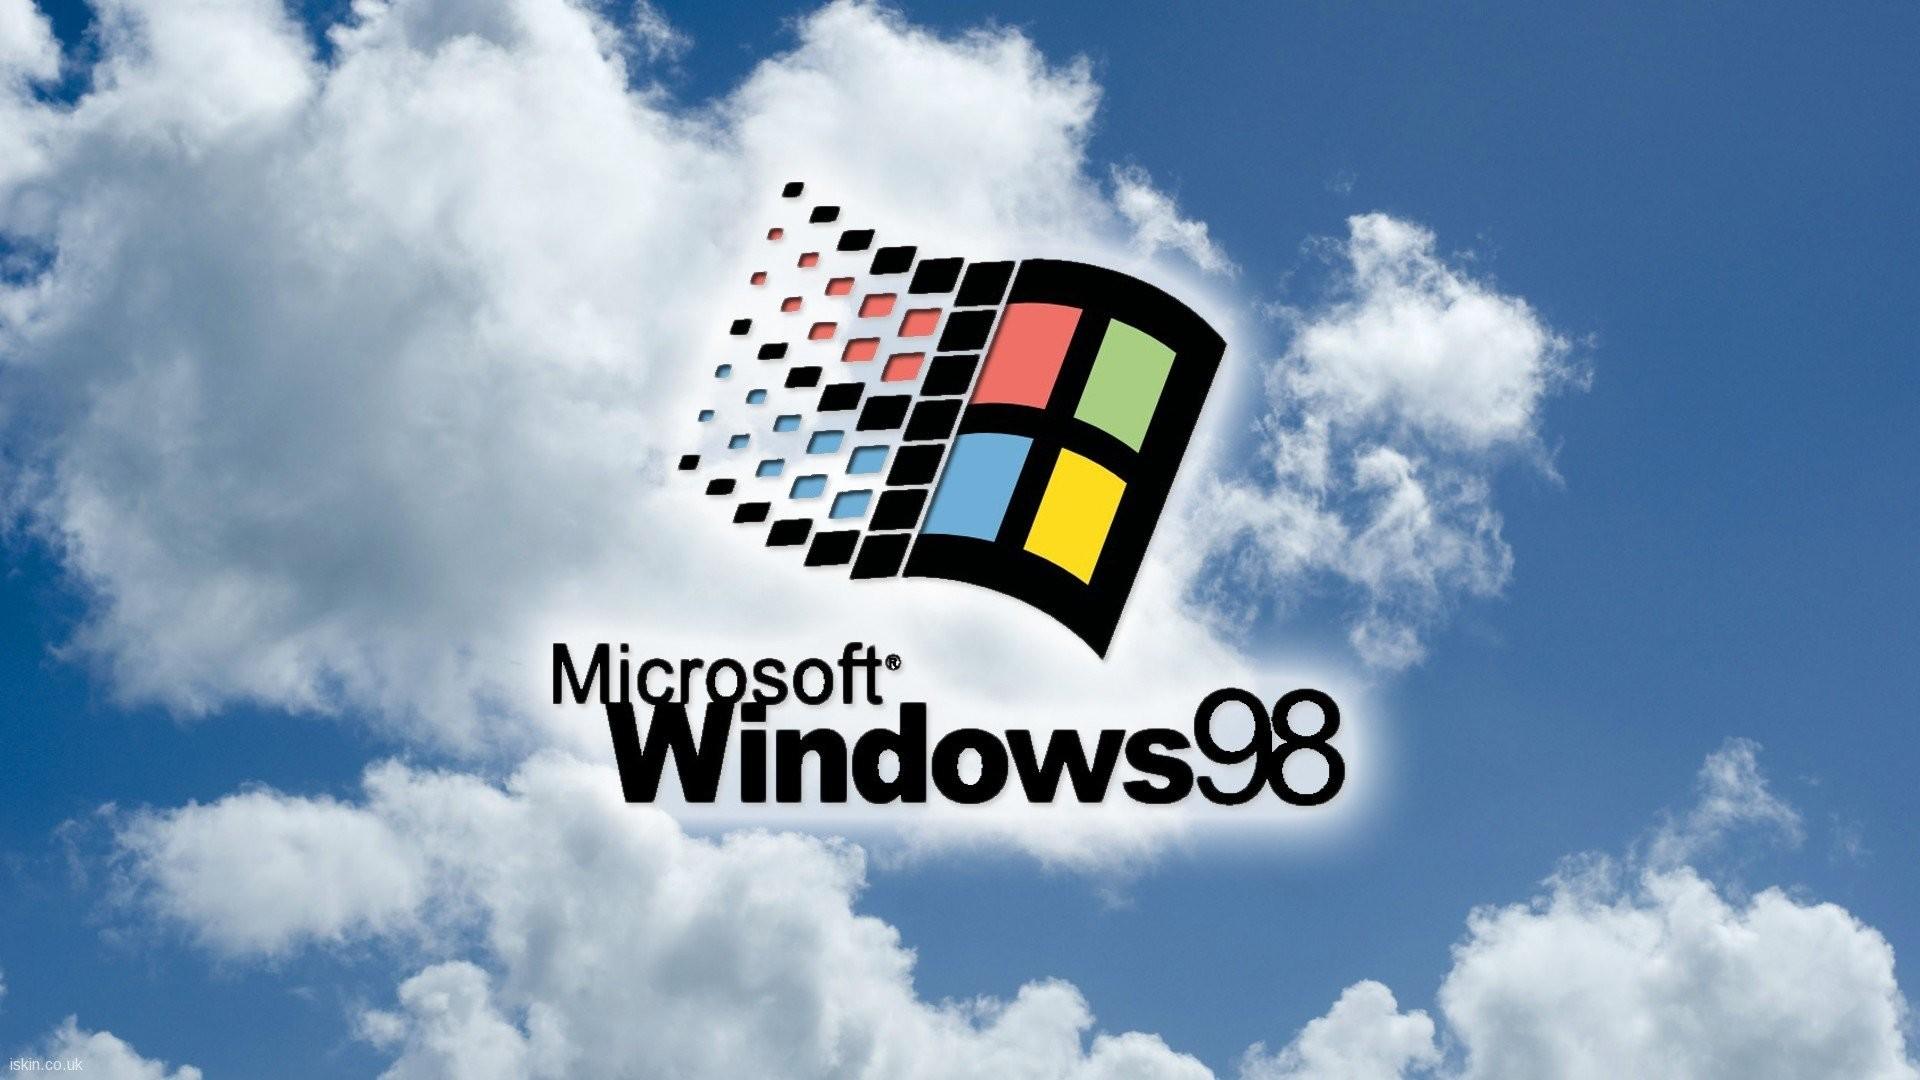 Windows 98 Microsoft Vintage 90s Computers